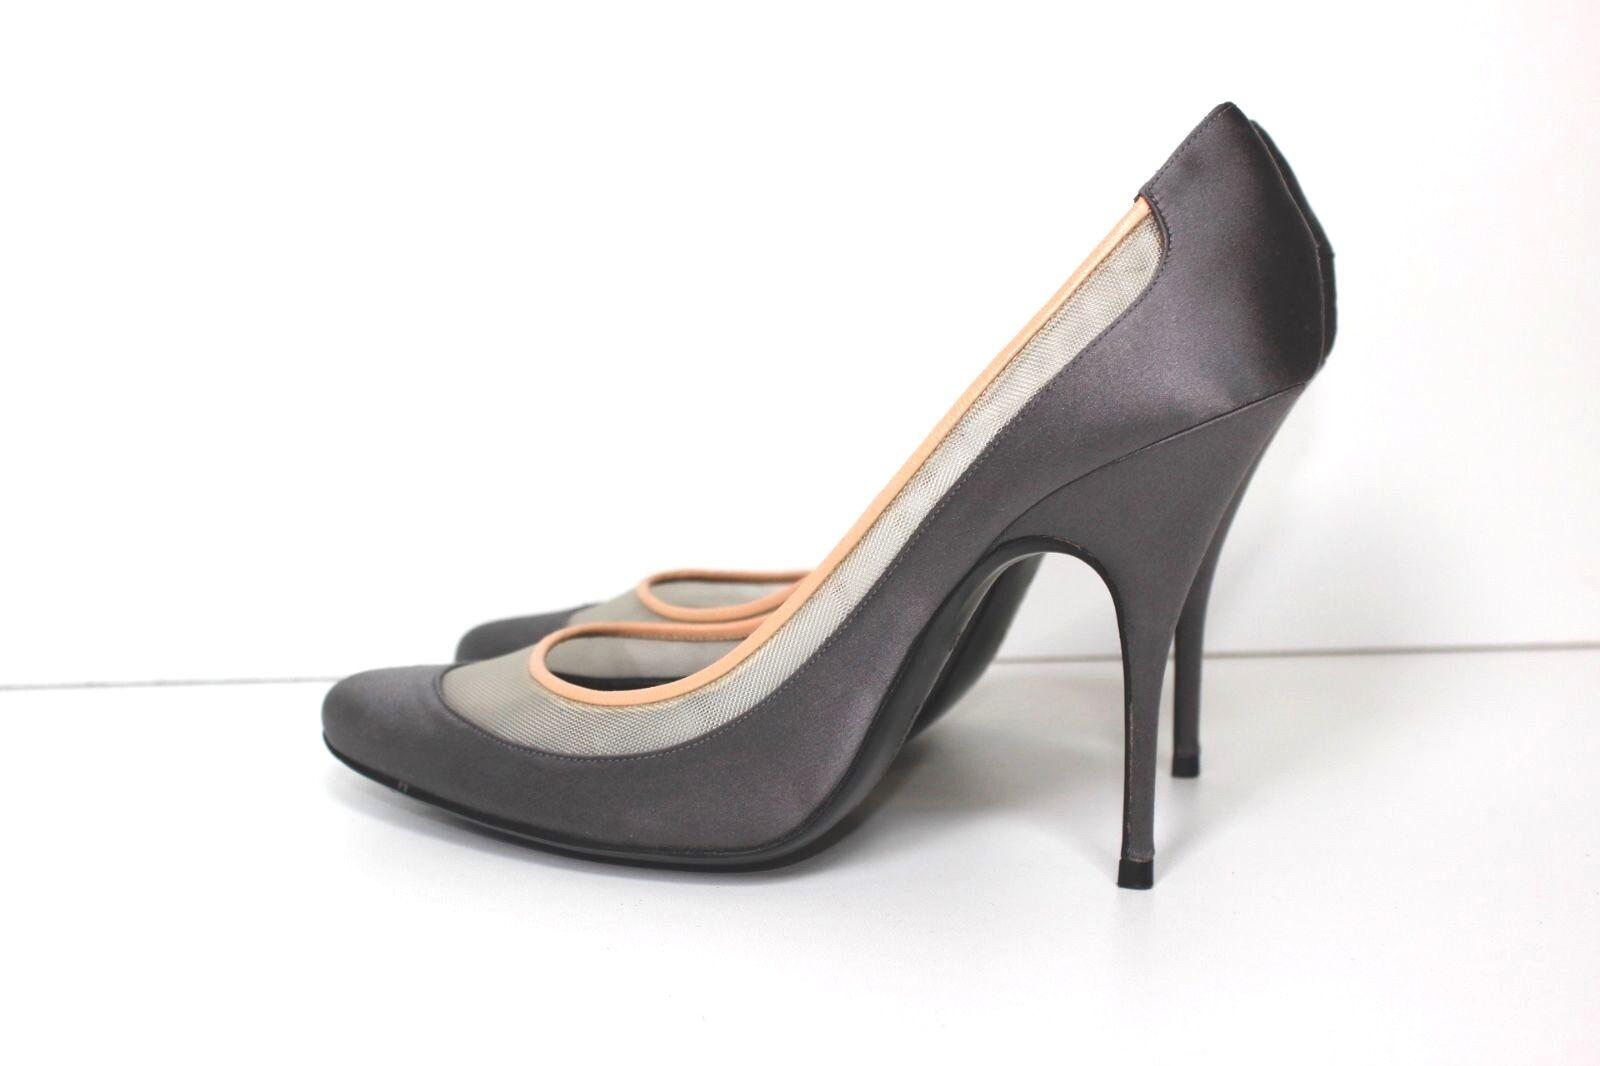 Givenchy Silver Satin Mesh Detail Almond 6 Toe Heel 39 UK 6 Almond a1ec83